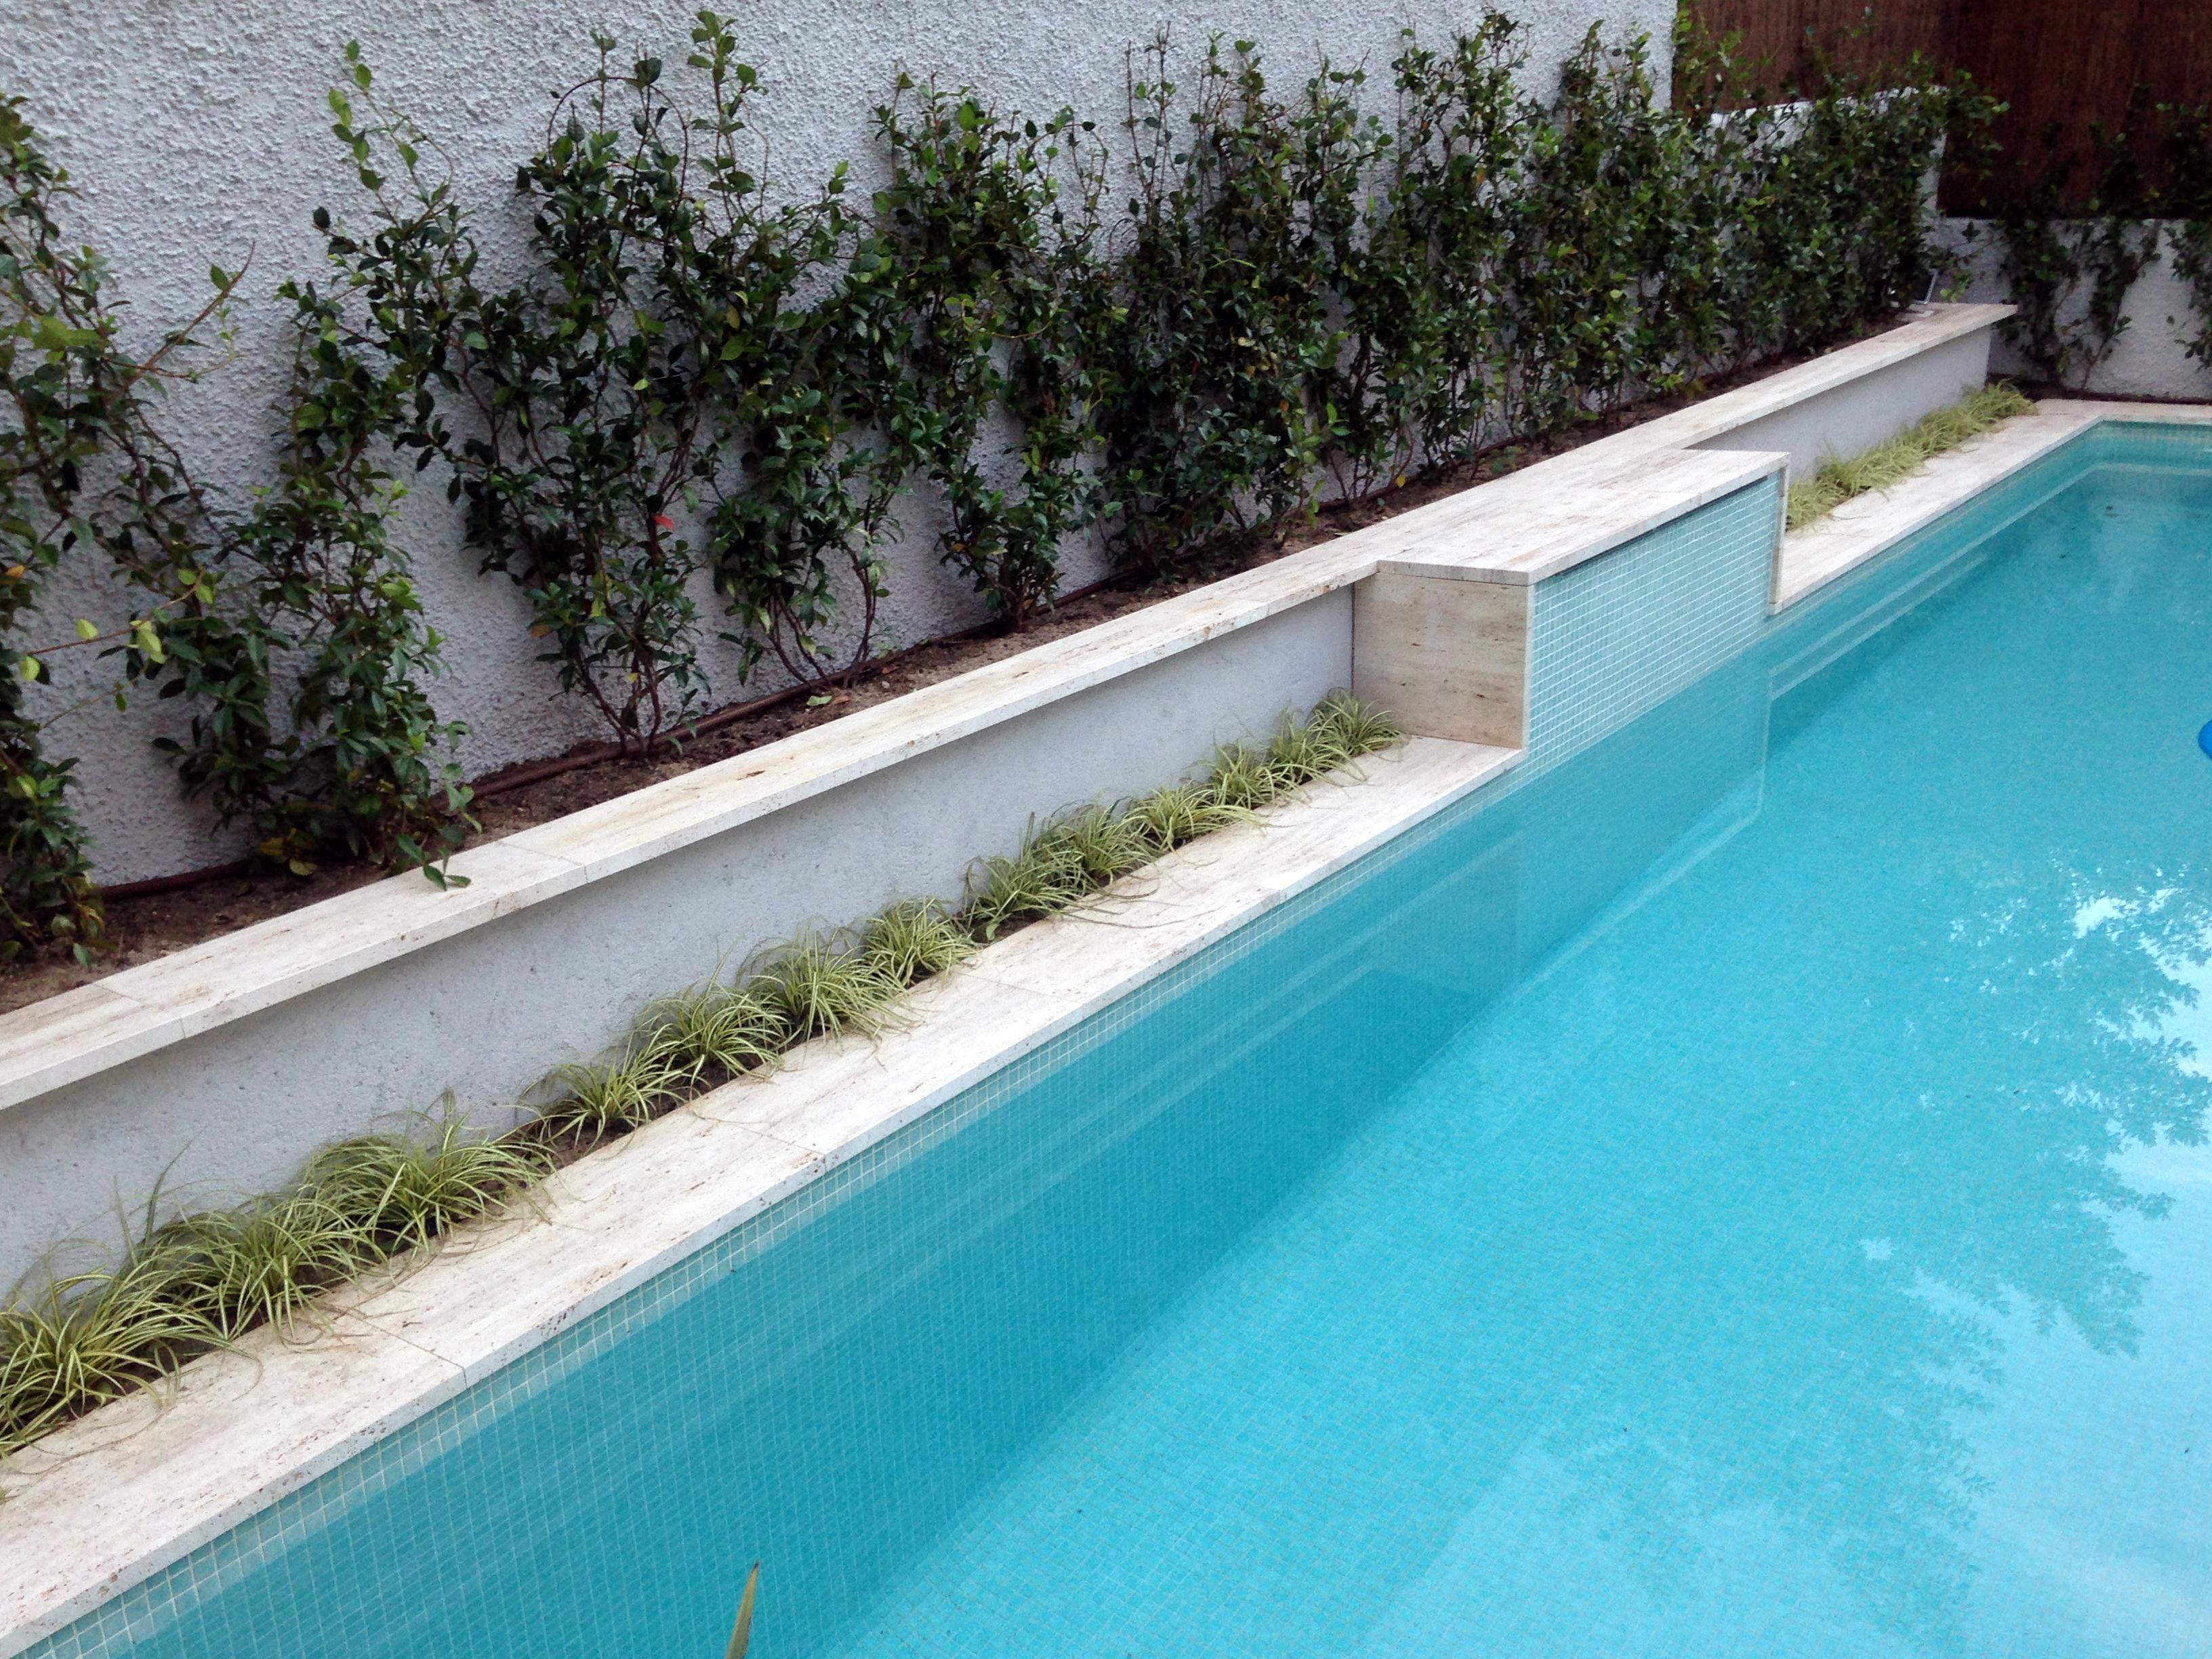 Proyecto de ejecucion de piscina privada top descripcin proyecto integral de jardn con piscina - Proyecto piscina privada ...